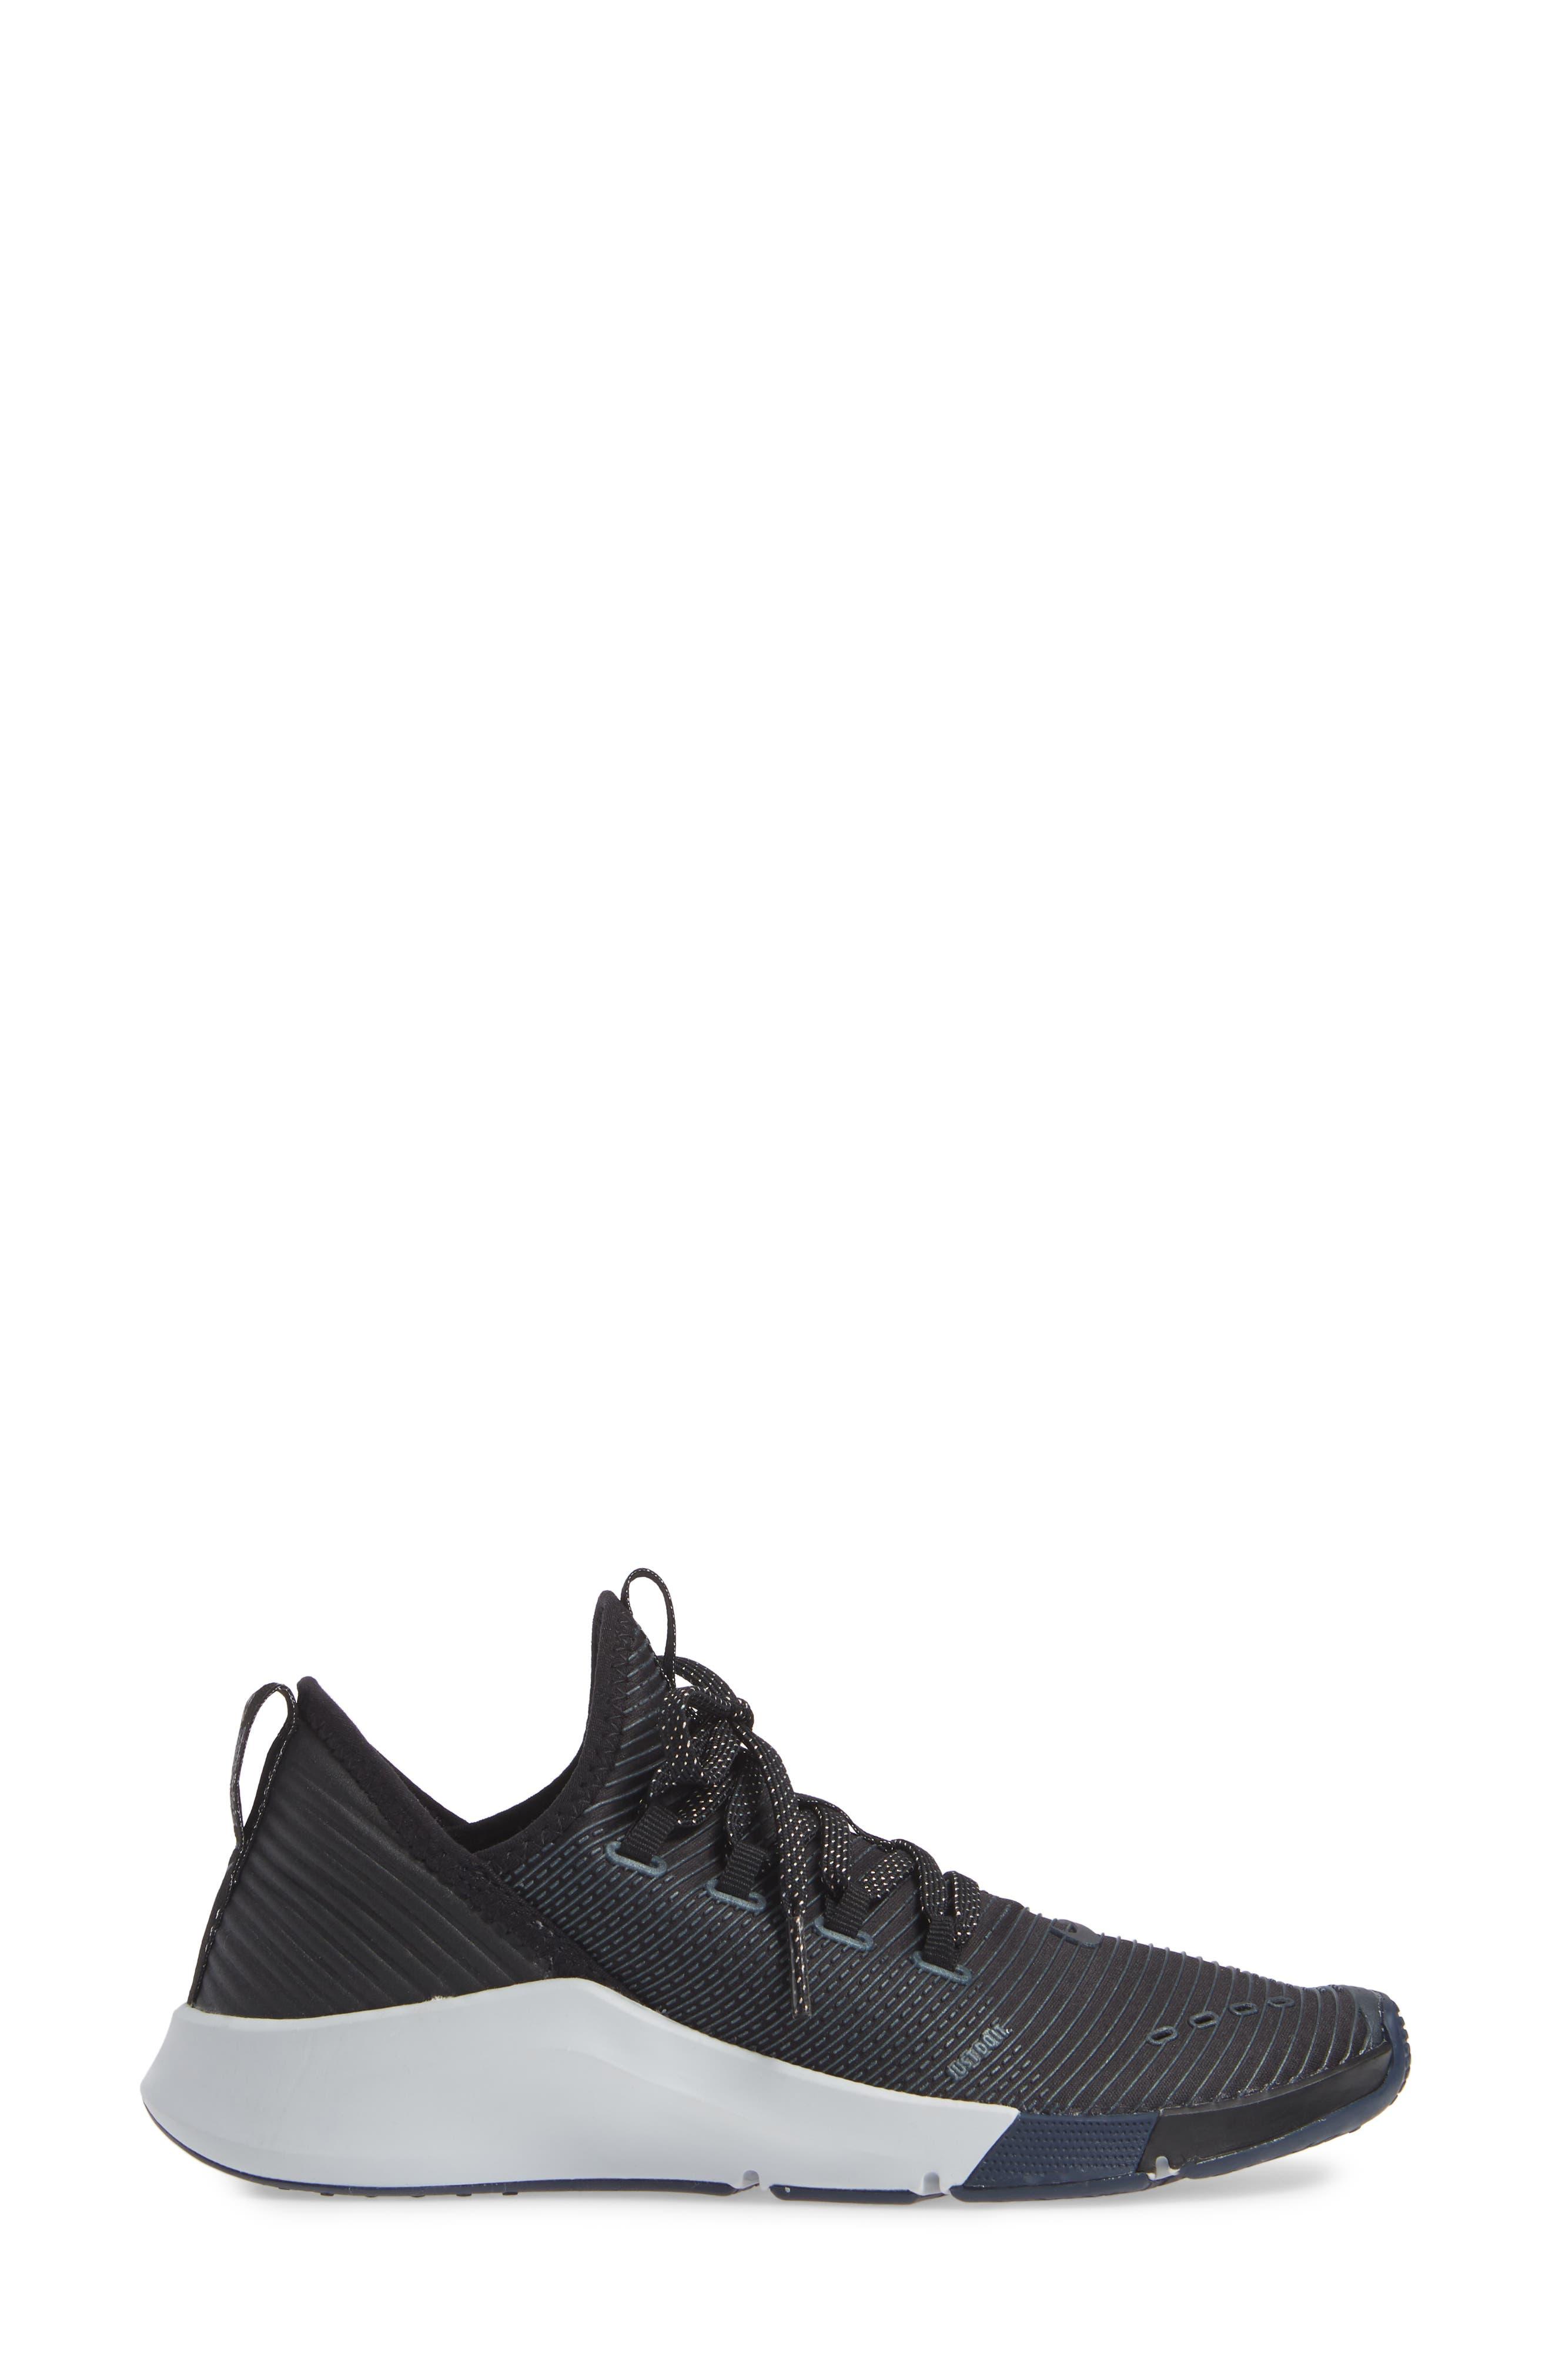 NIKE,                             Air Zoom Elevate Training Shoe,                             Alternate thumbnail 3, color,                             BLACK/ METALLIC NAVY- NAVY